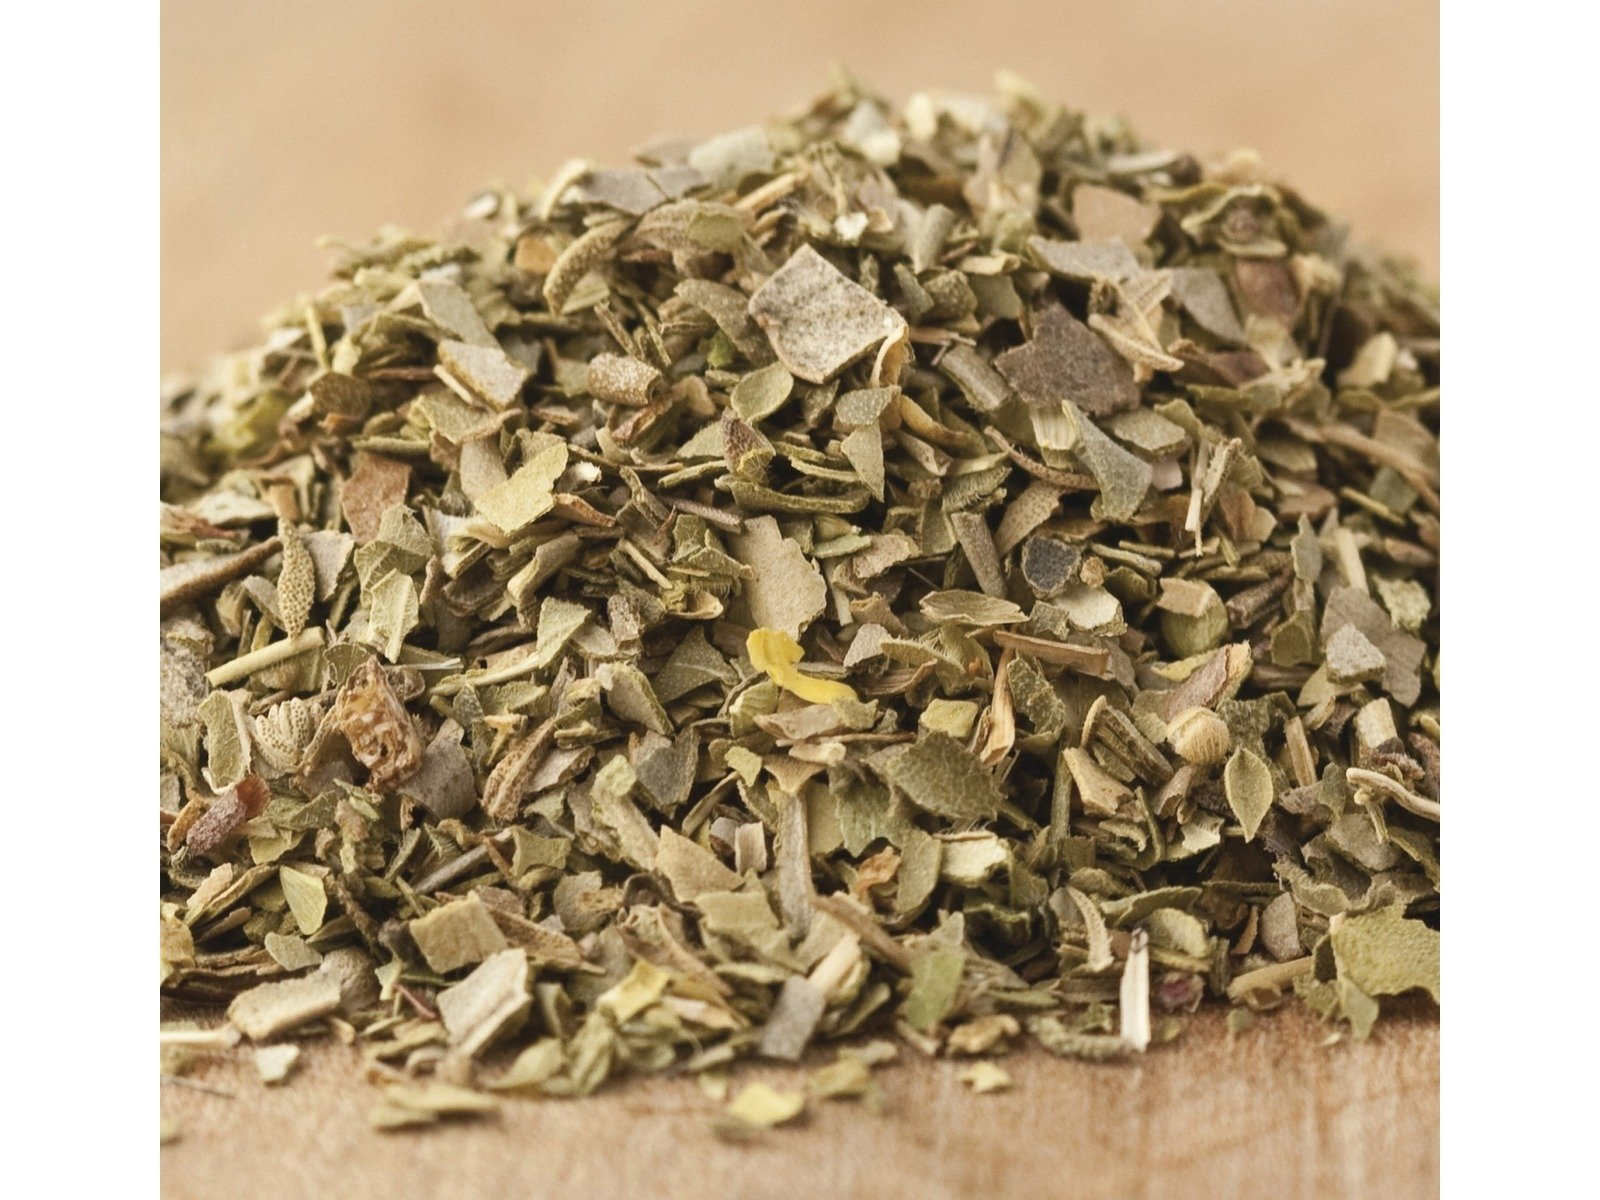 Oregano Cut & Sifted - Culinary Herb - USA - One Pound